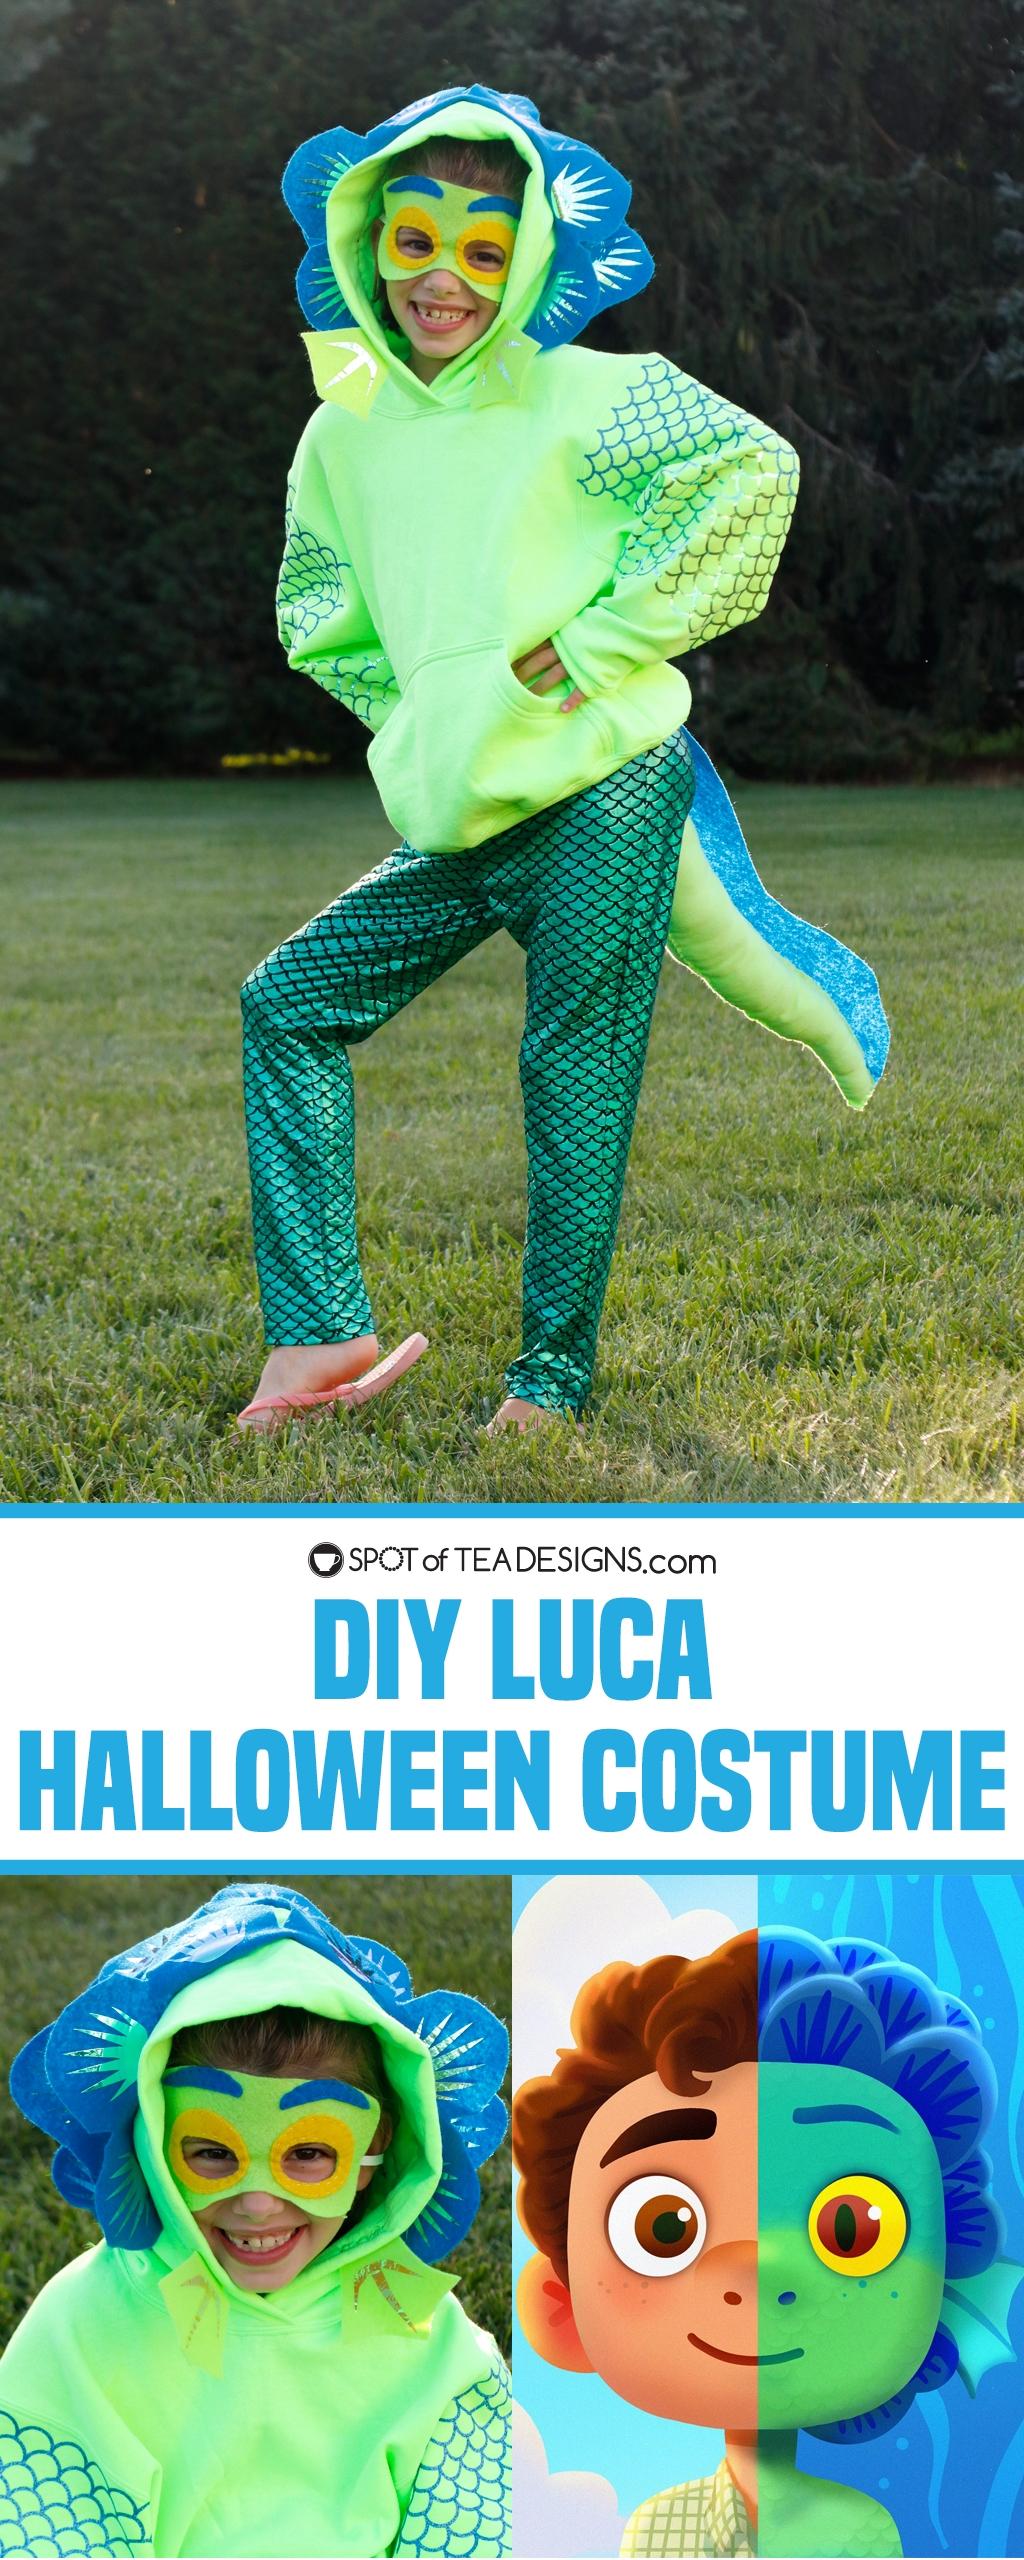 DIY Luca Halloween Costume | spotofteadesigns.com